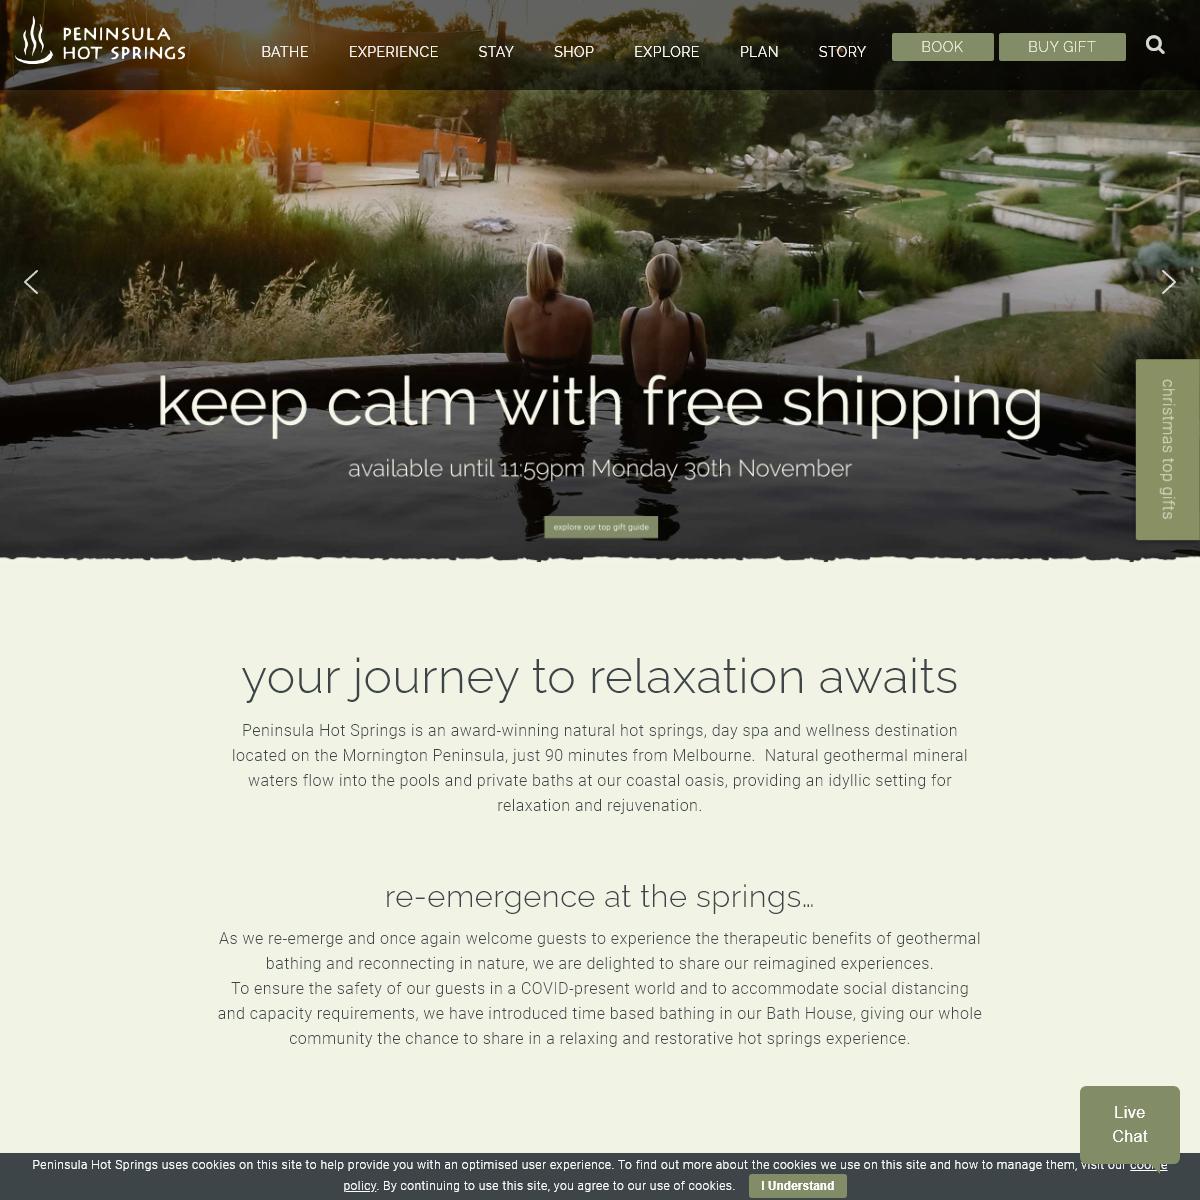 Peninsula Hot Springs, Mornington, Spa, Massage - Gift Certificates Online